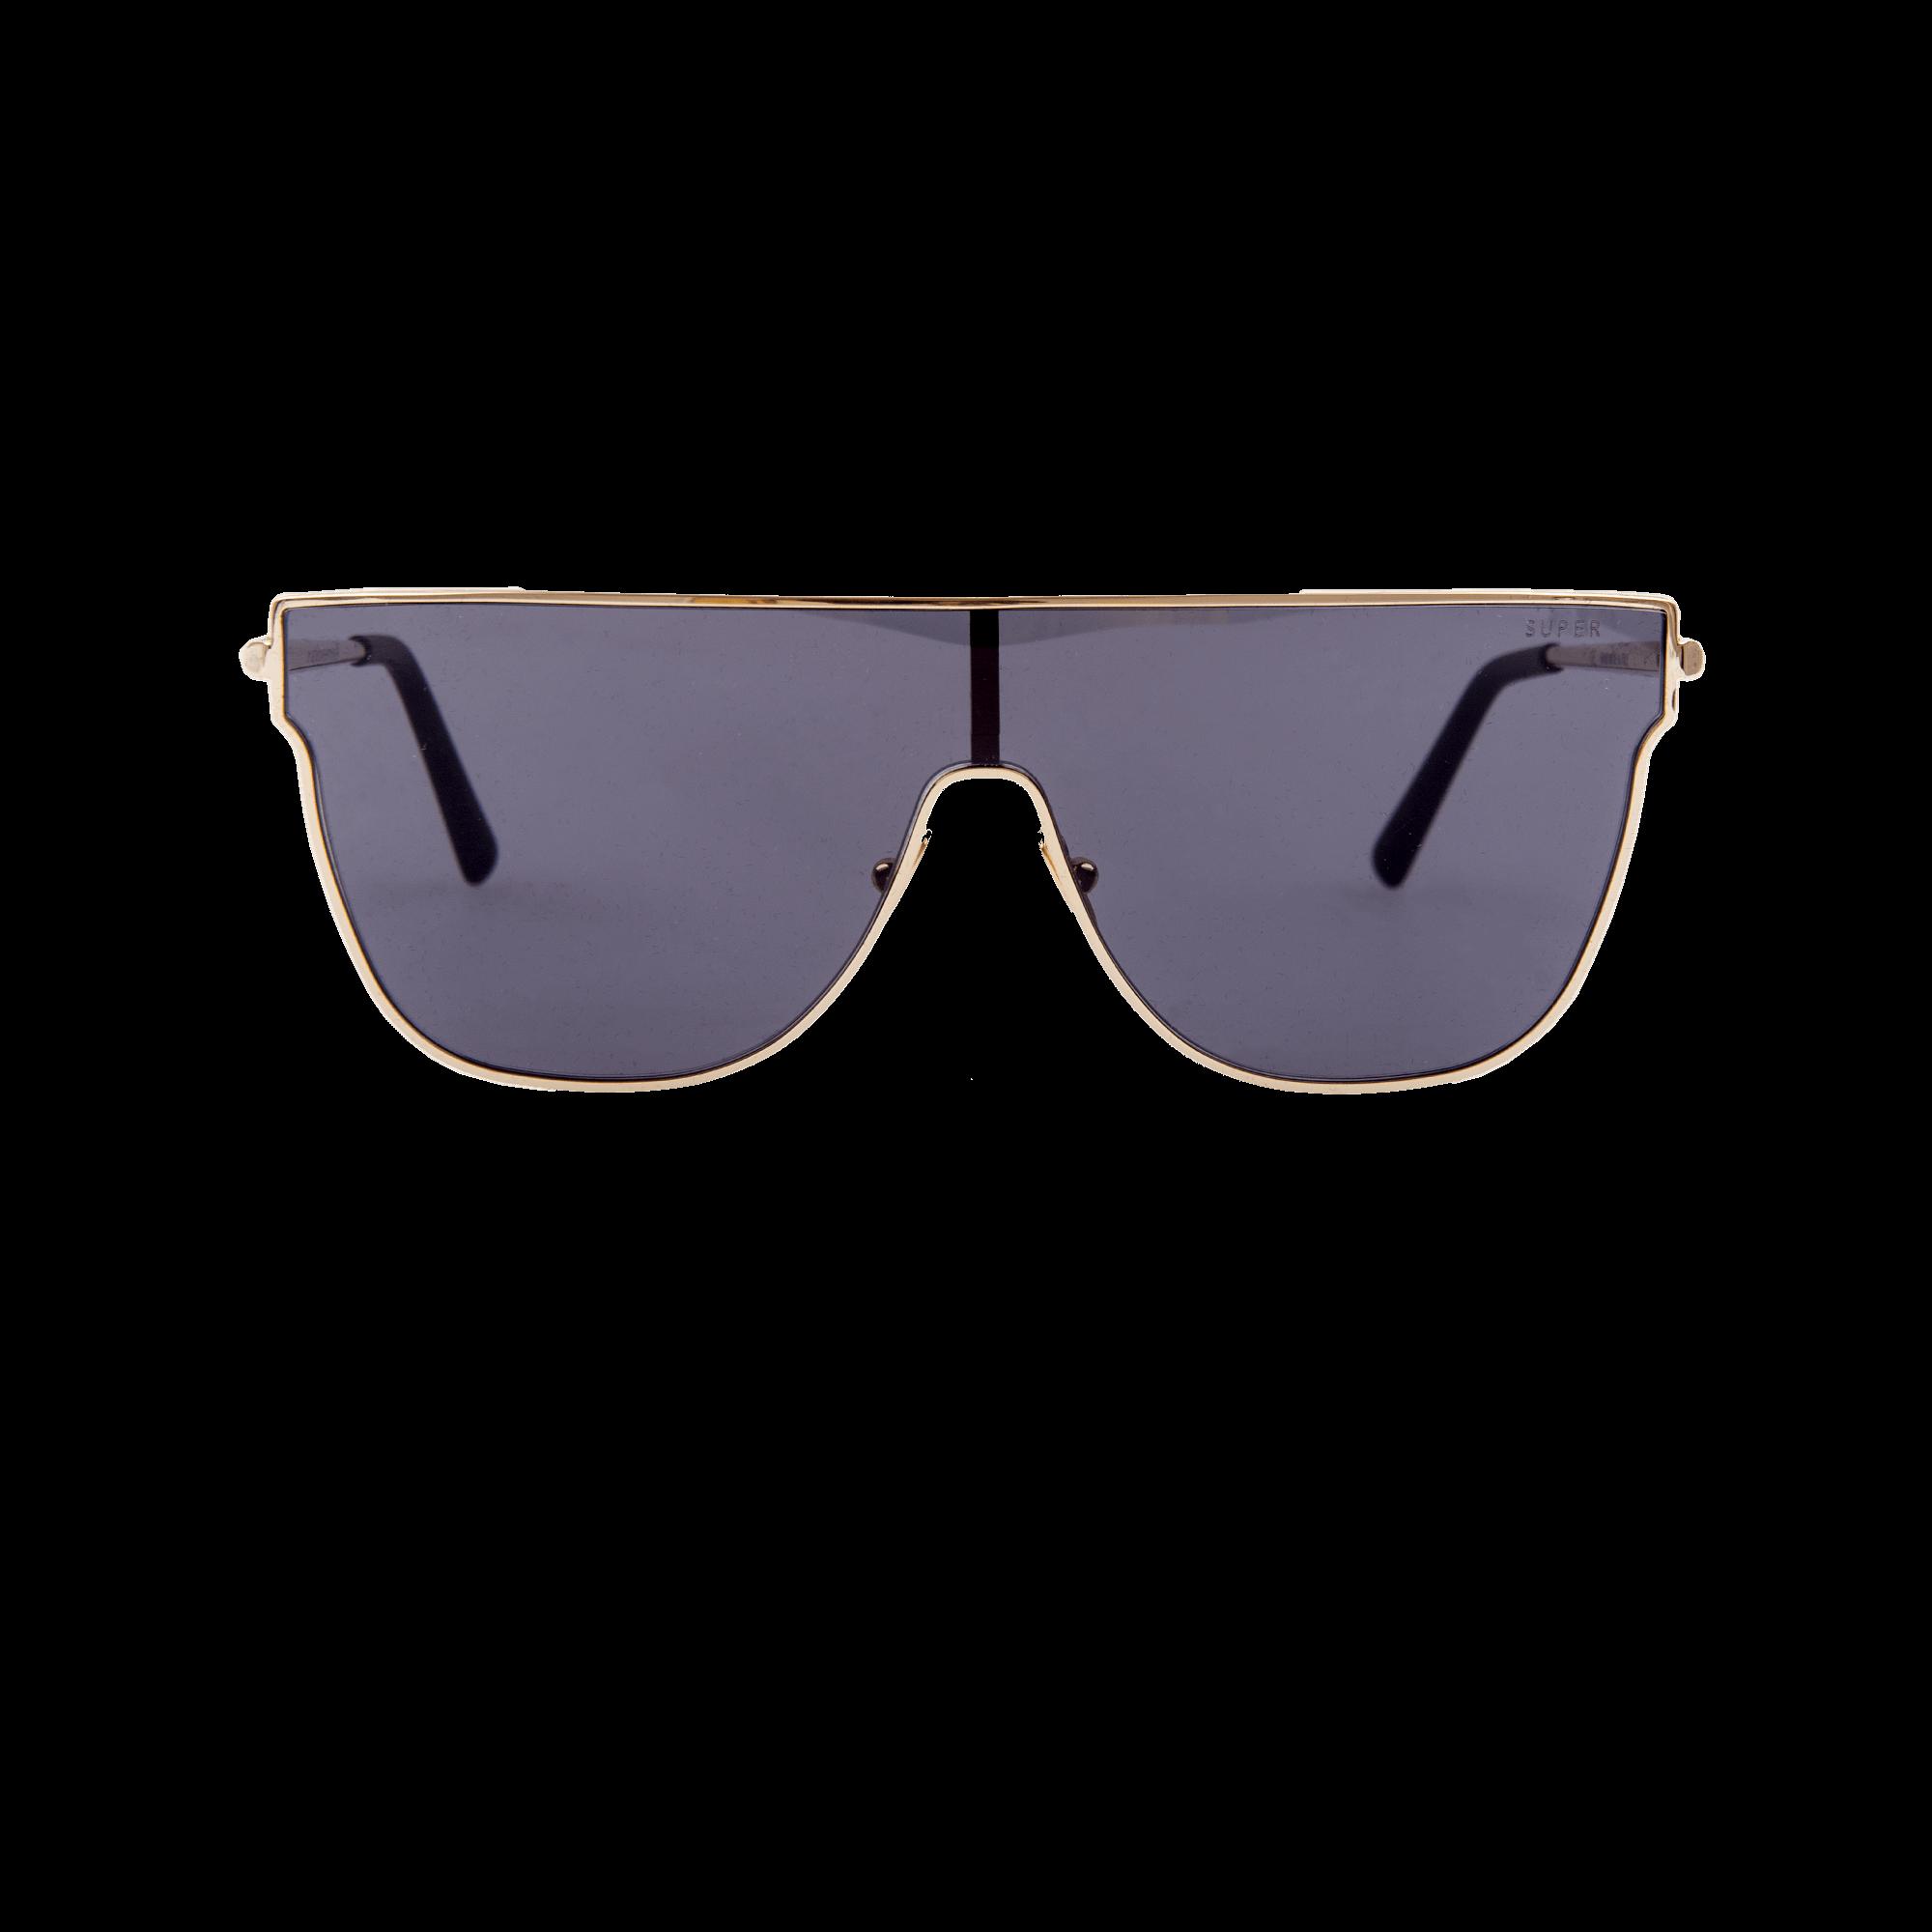 55 Top Blackgold Lenz Sunglasses By Retrosuperfuture Super Flat b6yYf7gv